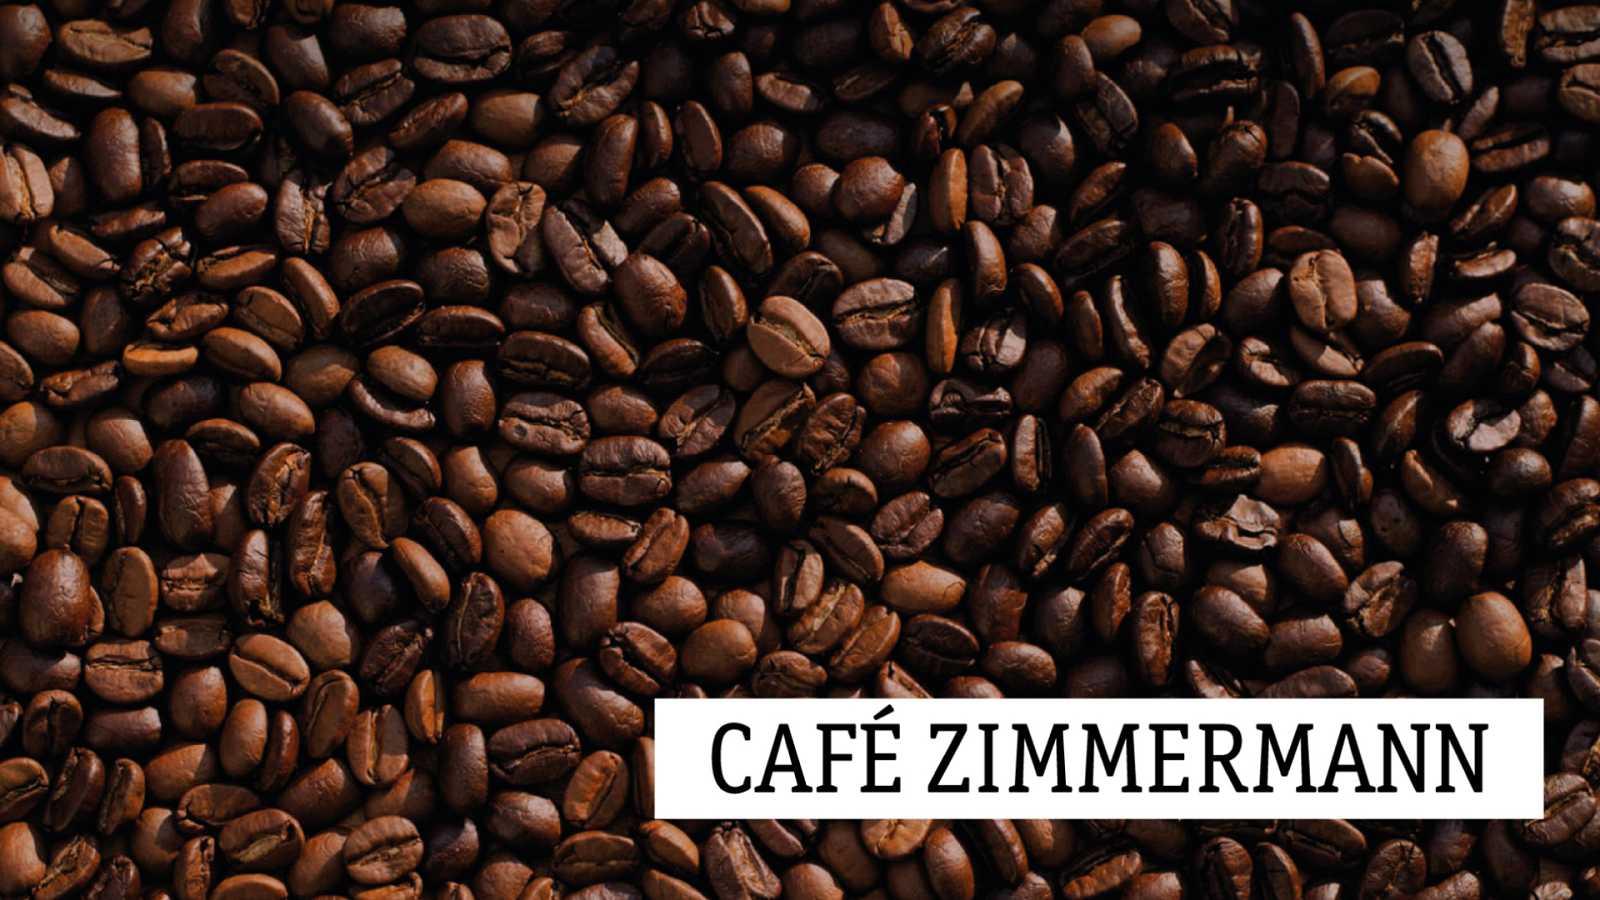 Café Zimmermann - El director de cine Chris Marker - 02/02/21 - escuchar ahora